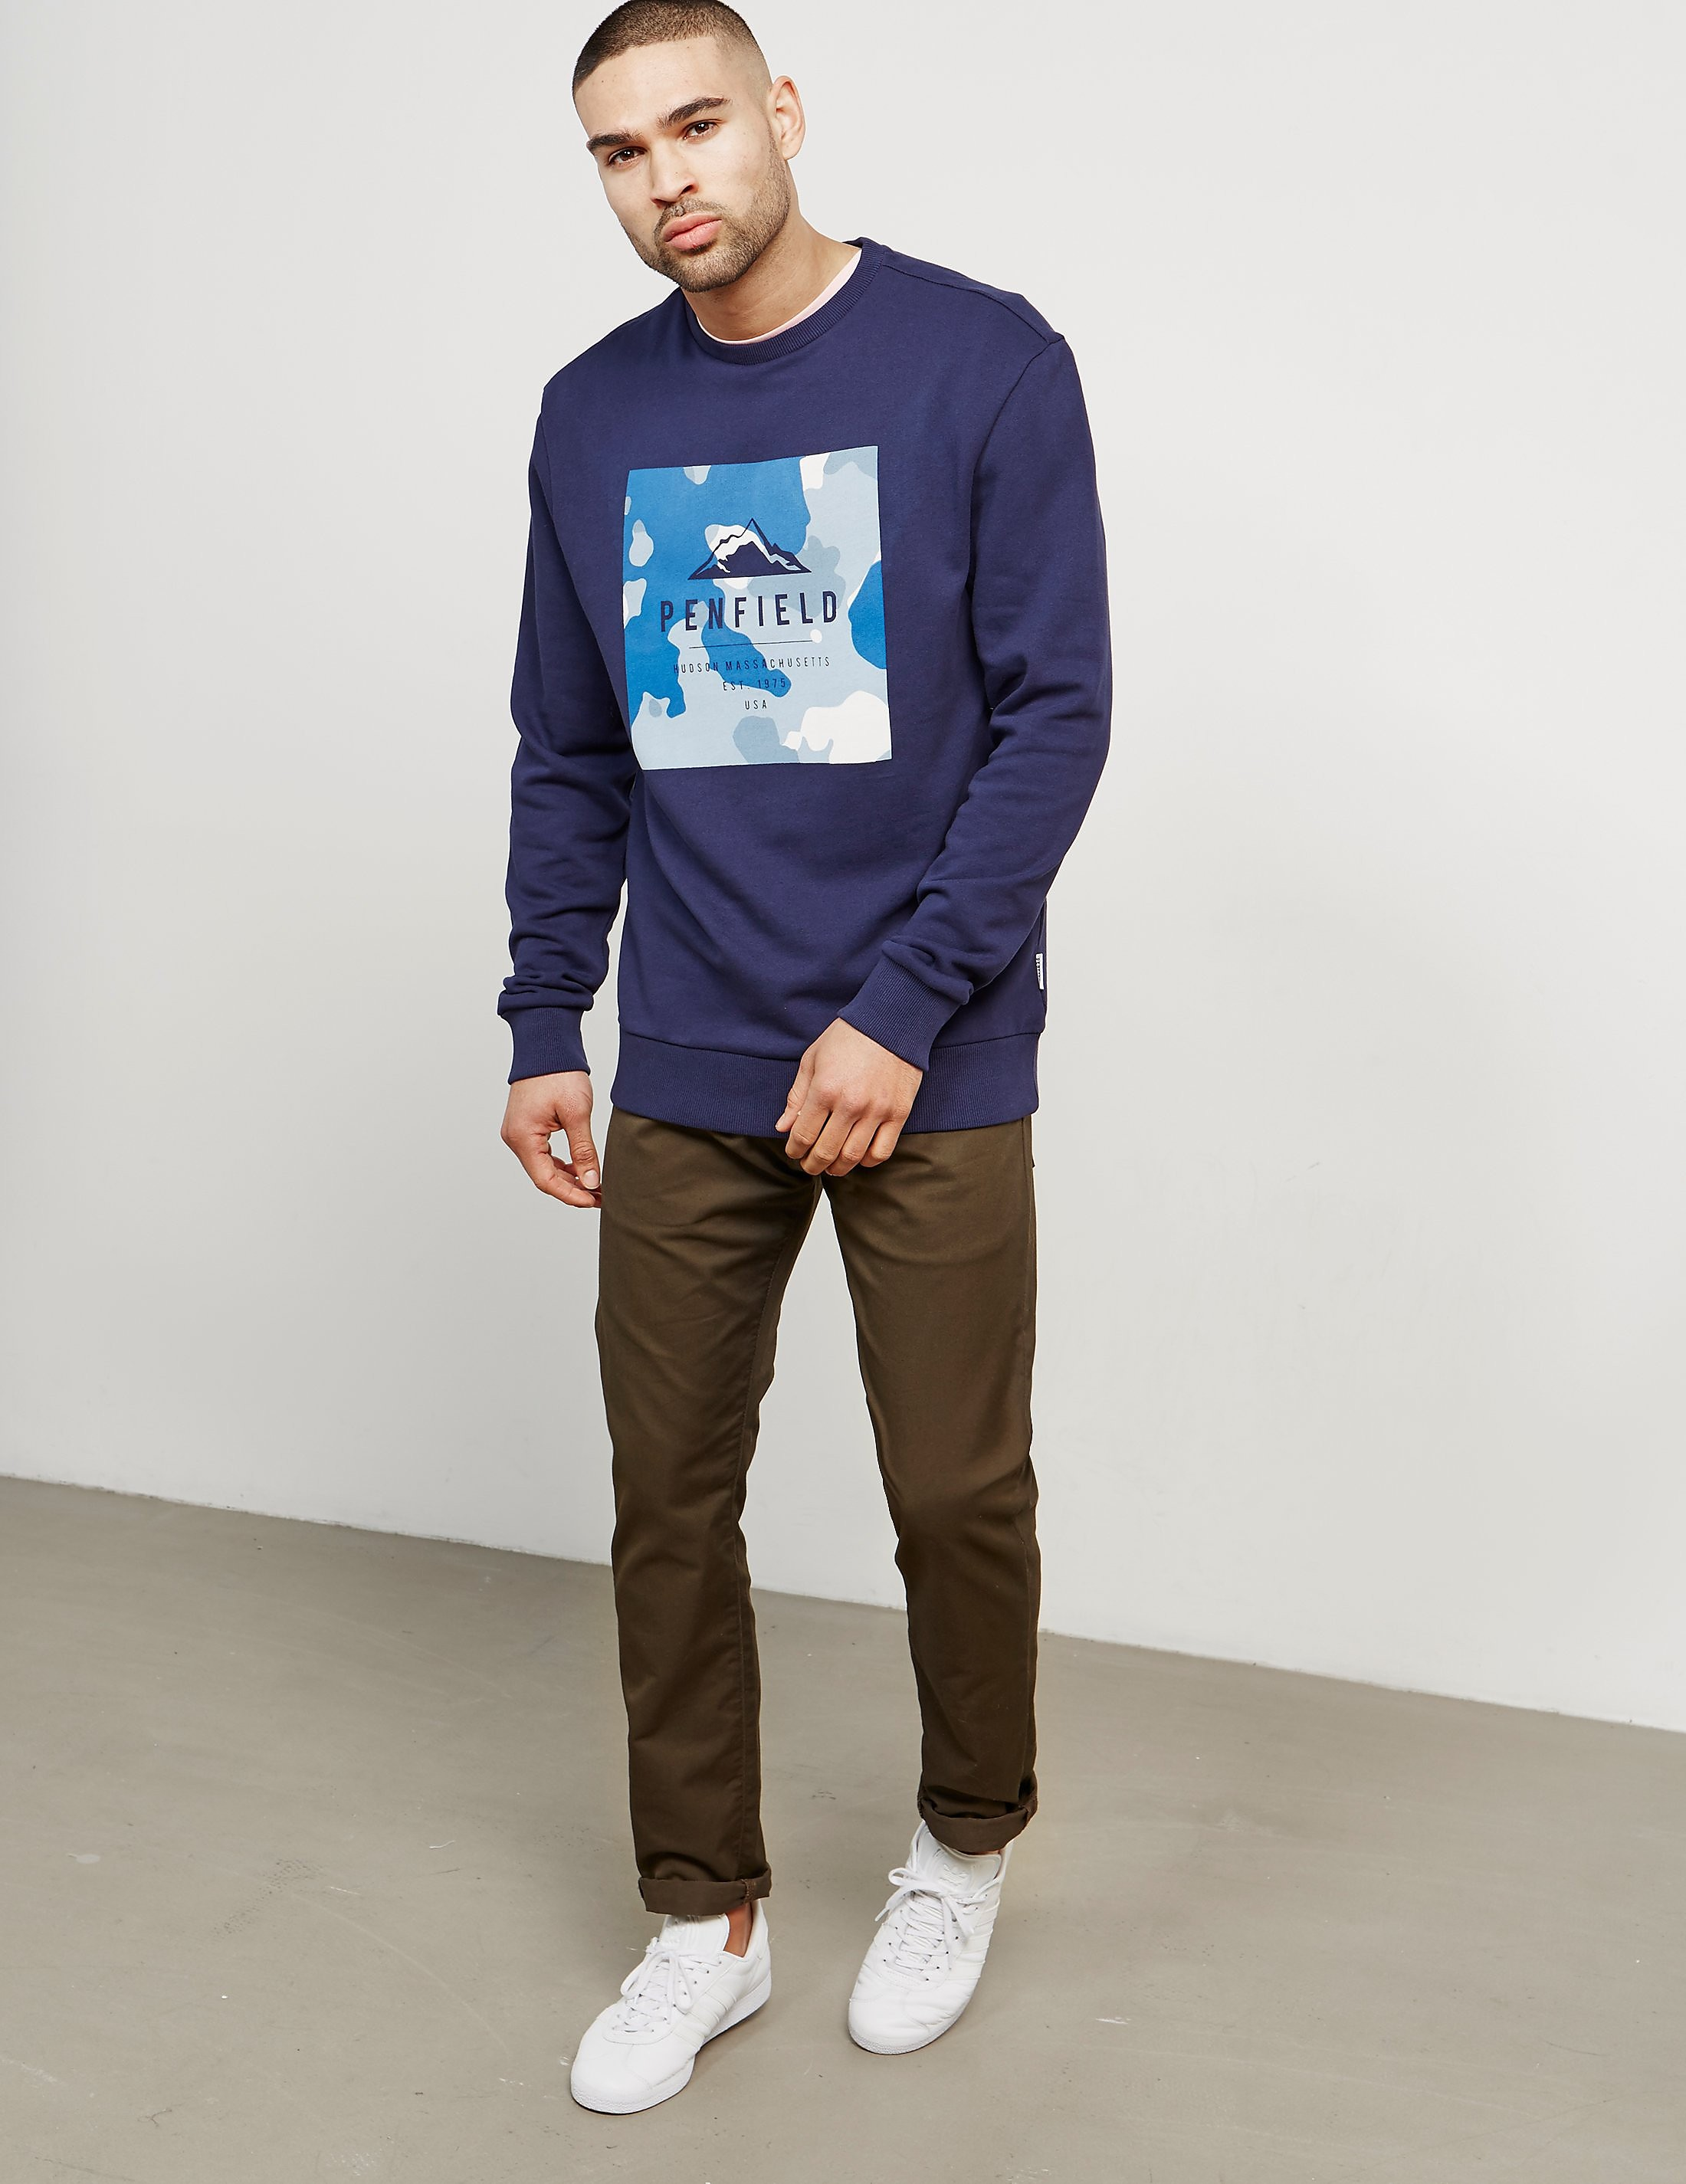 Penfield Cullen Square Sweatshirt